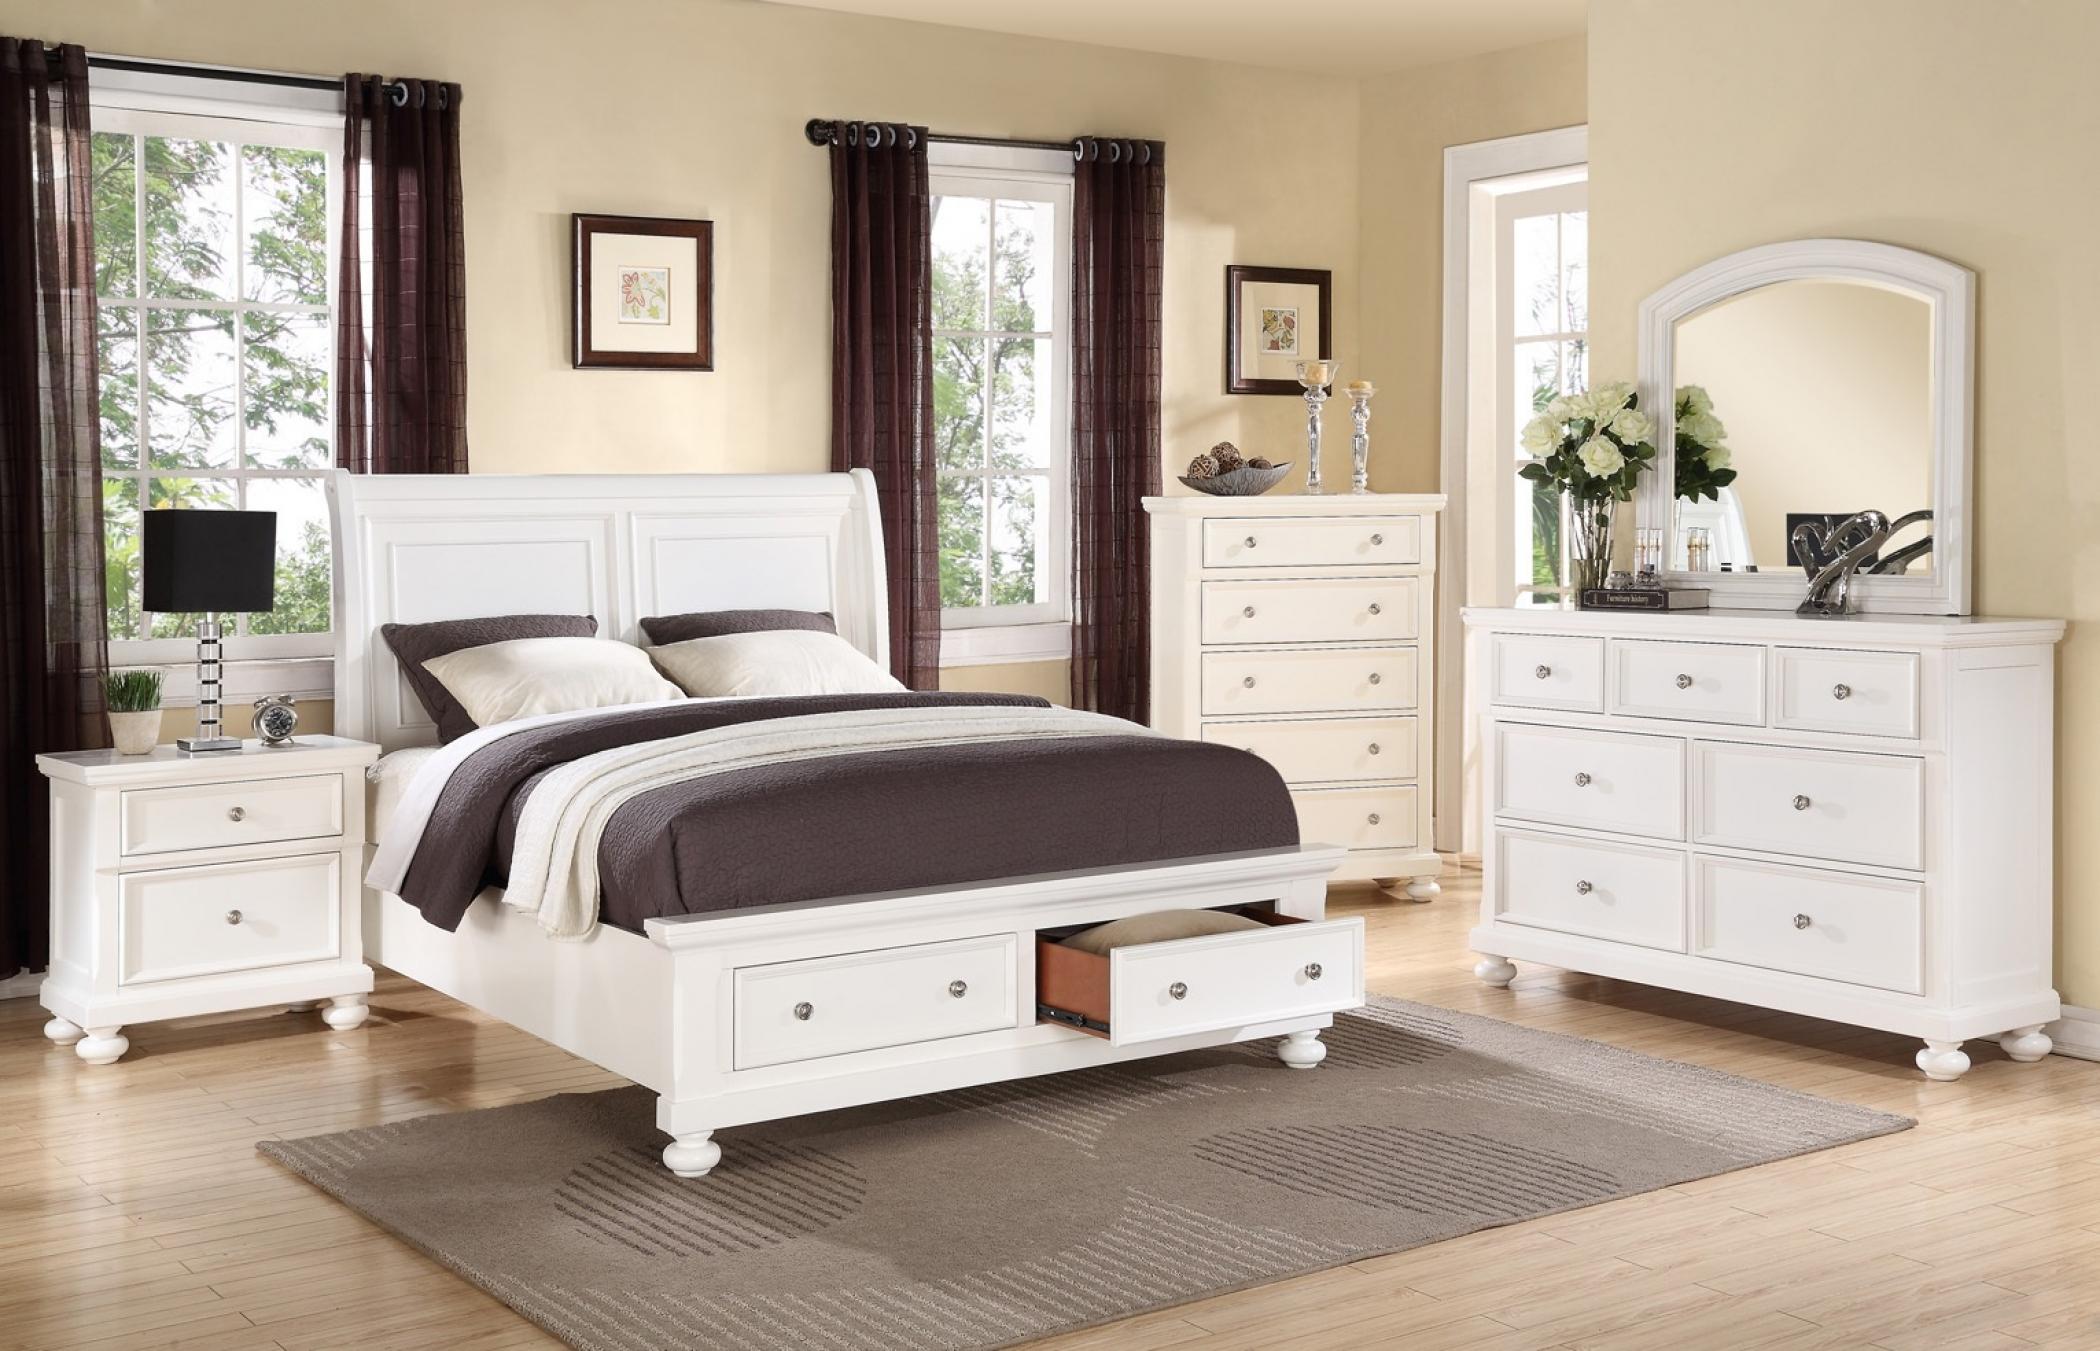 b2901 Fw – Lisys Discount Furniture